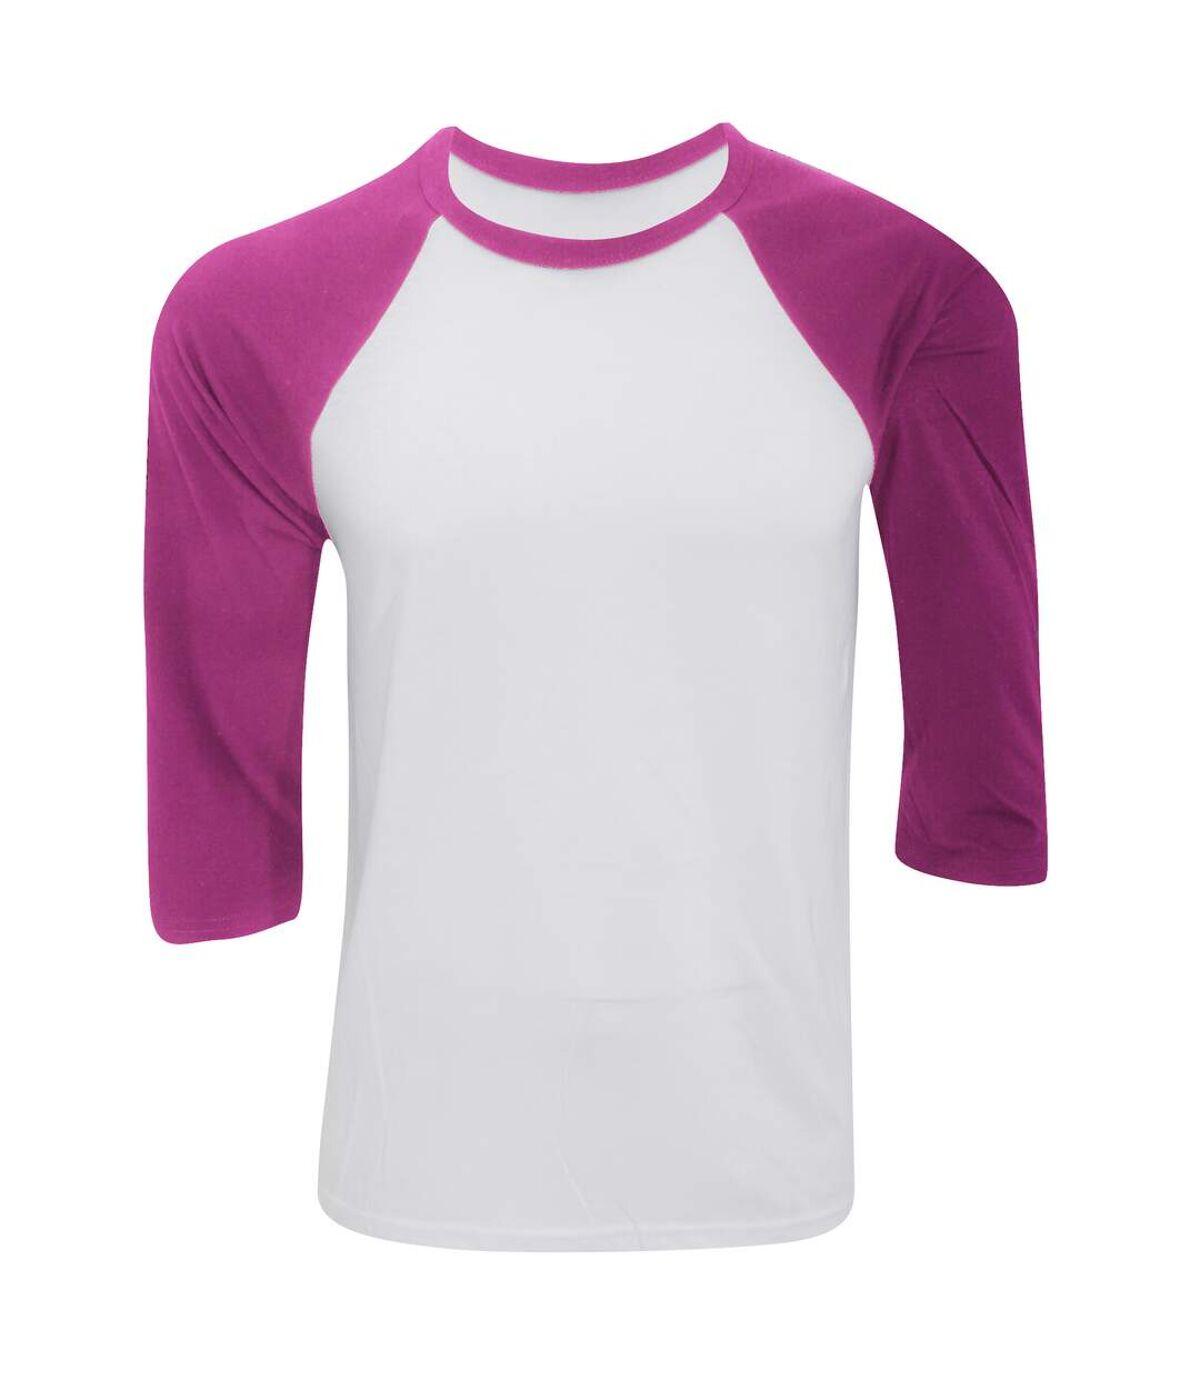 Canvas Mens 3/4 Sleeve Baseball T-Shirt (White/Charcoal Triblend) - UTBC1332